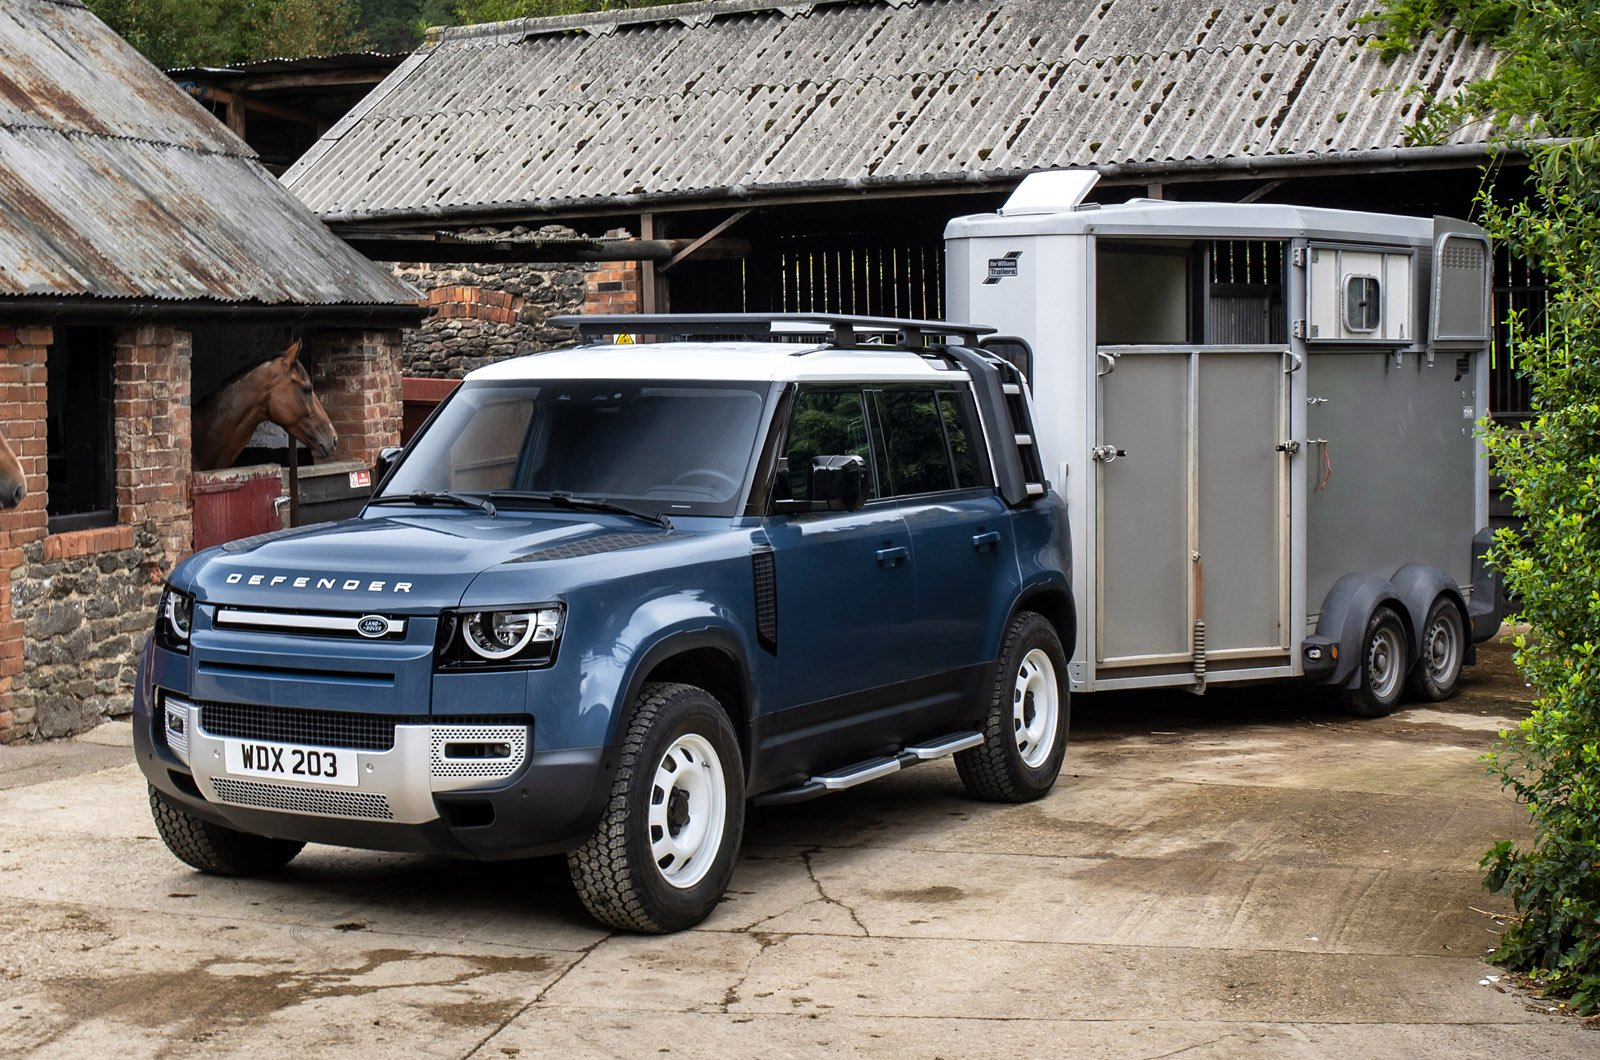 Land Rover Defender Hard Top pulling horsebox